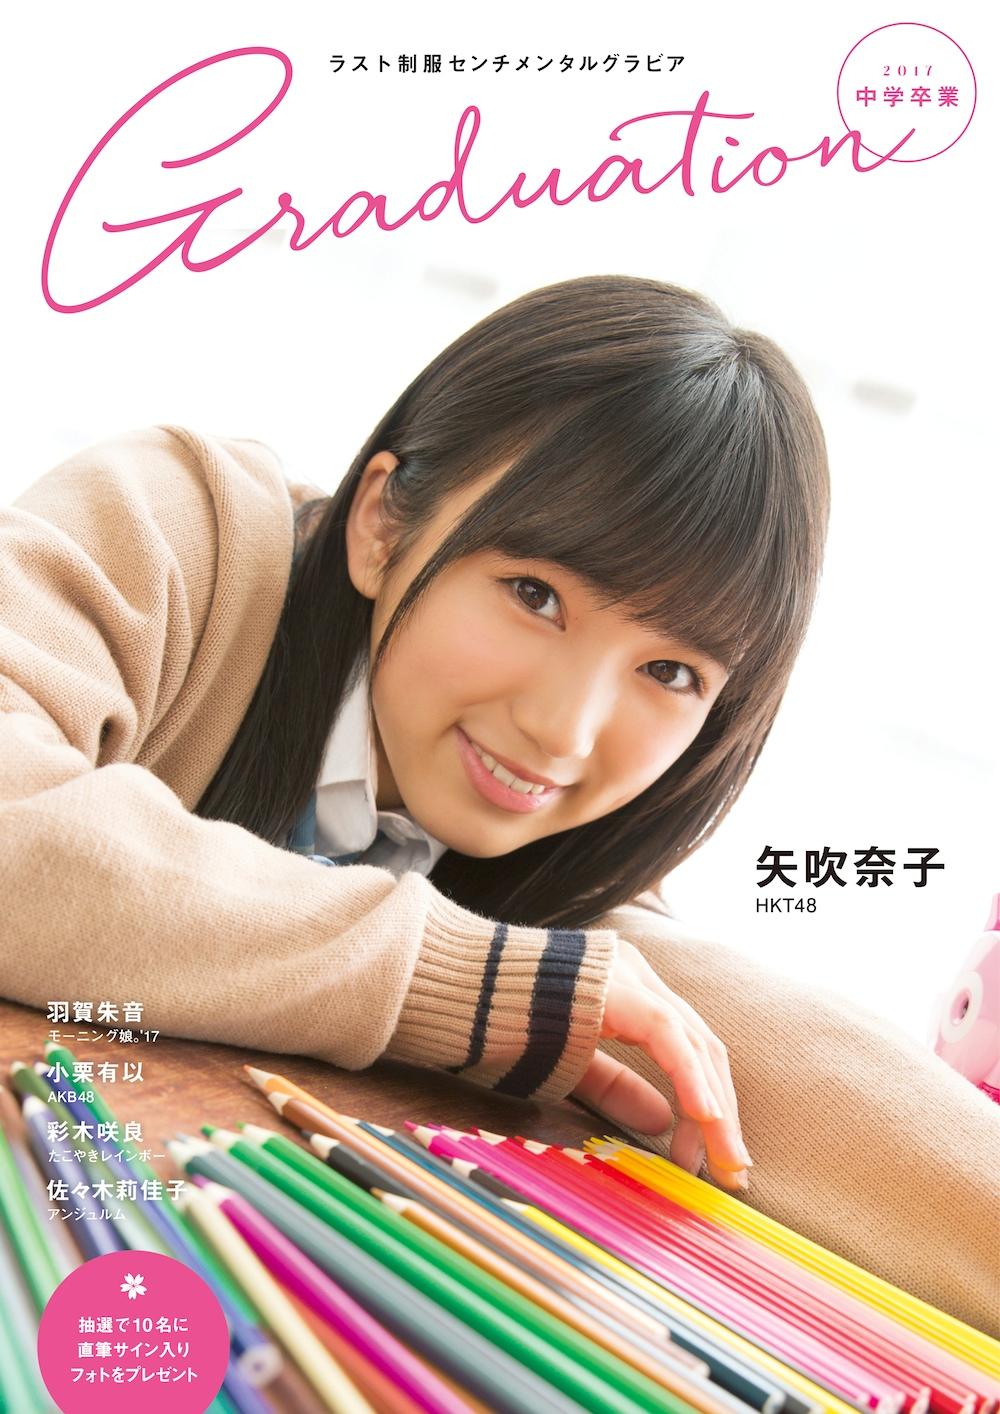 矢吹奈子(HKT48)中学卒業・Graduation2017